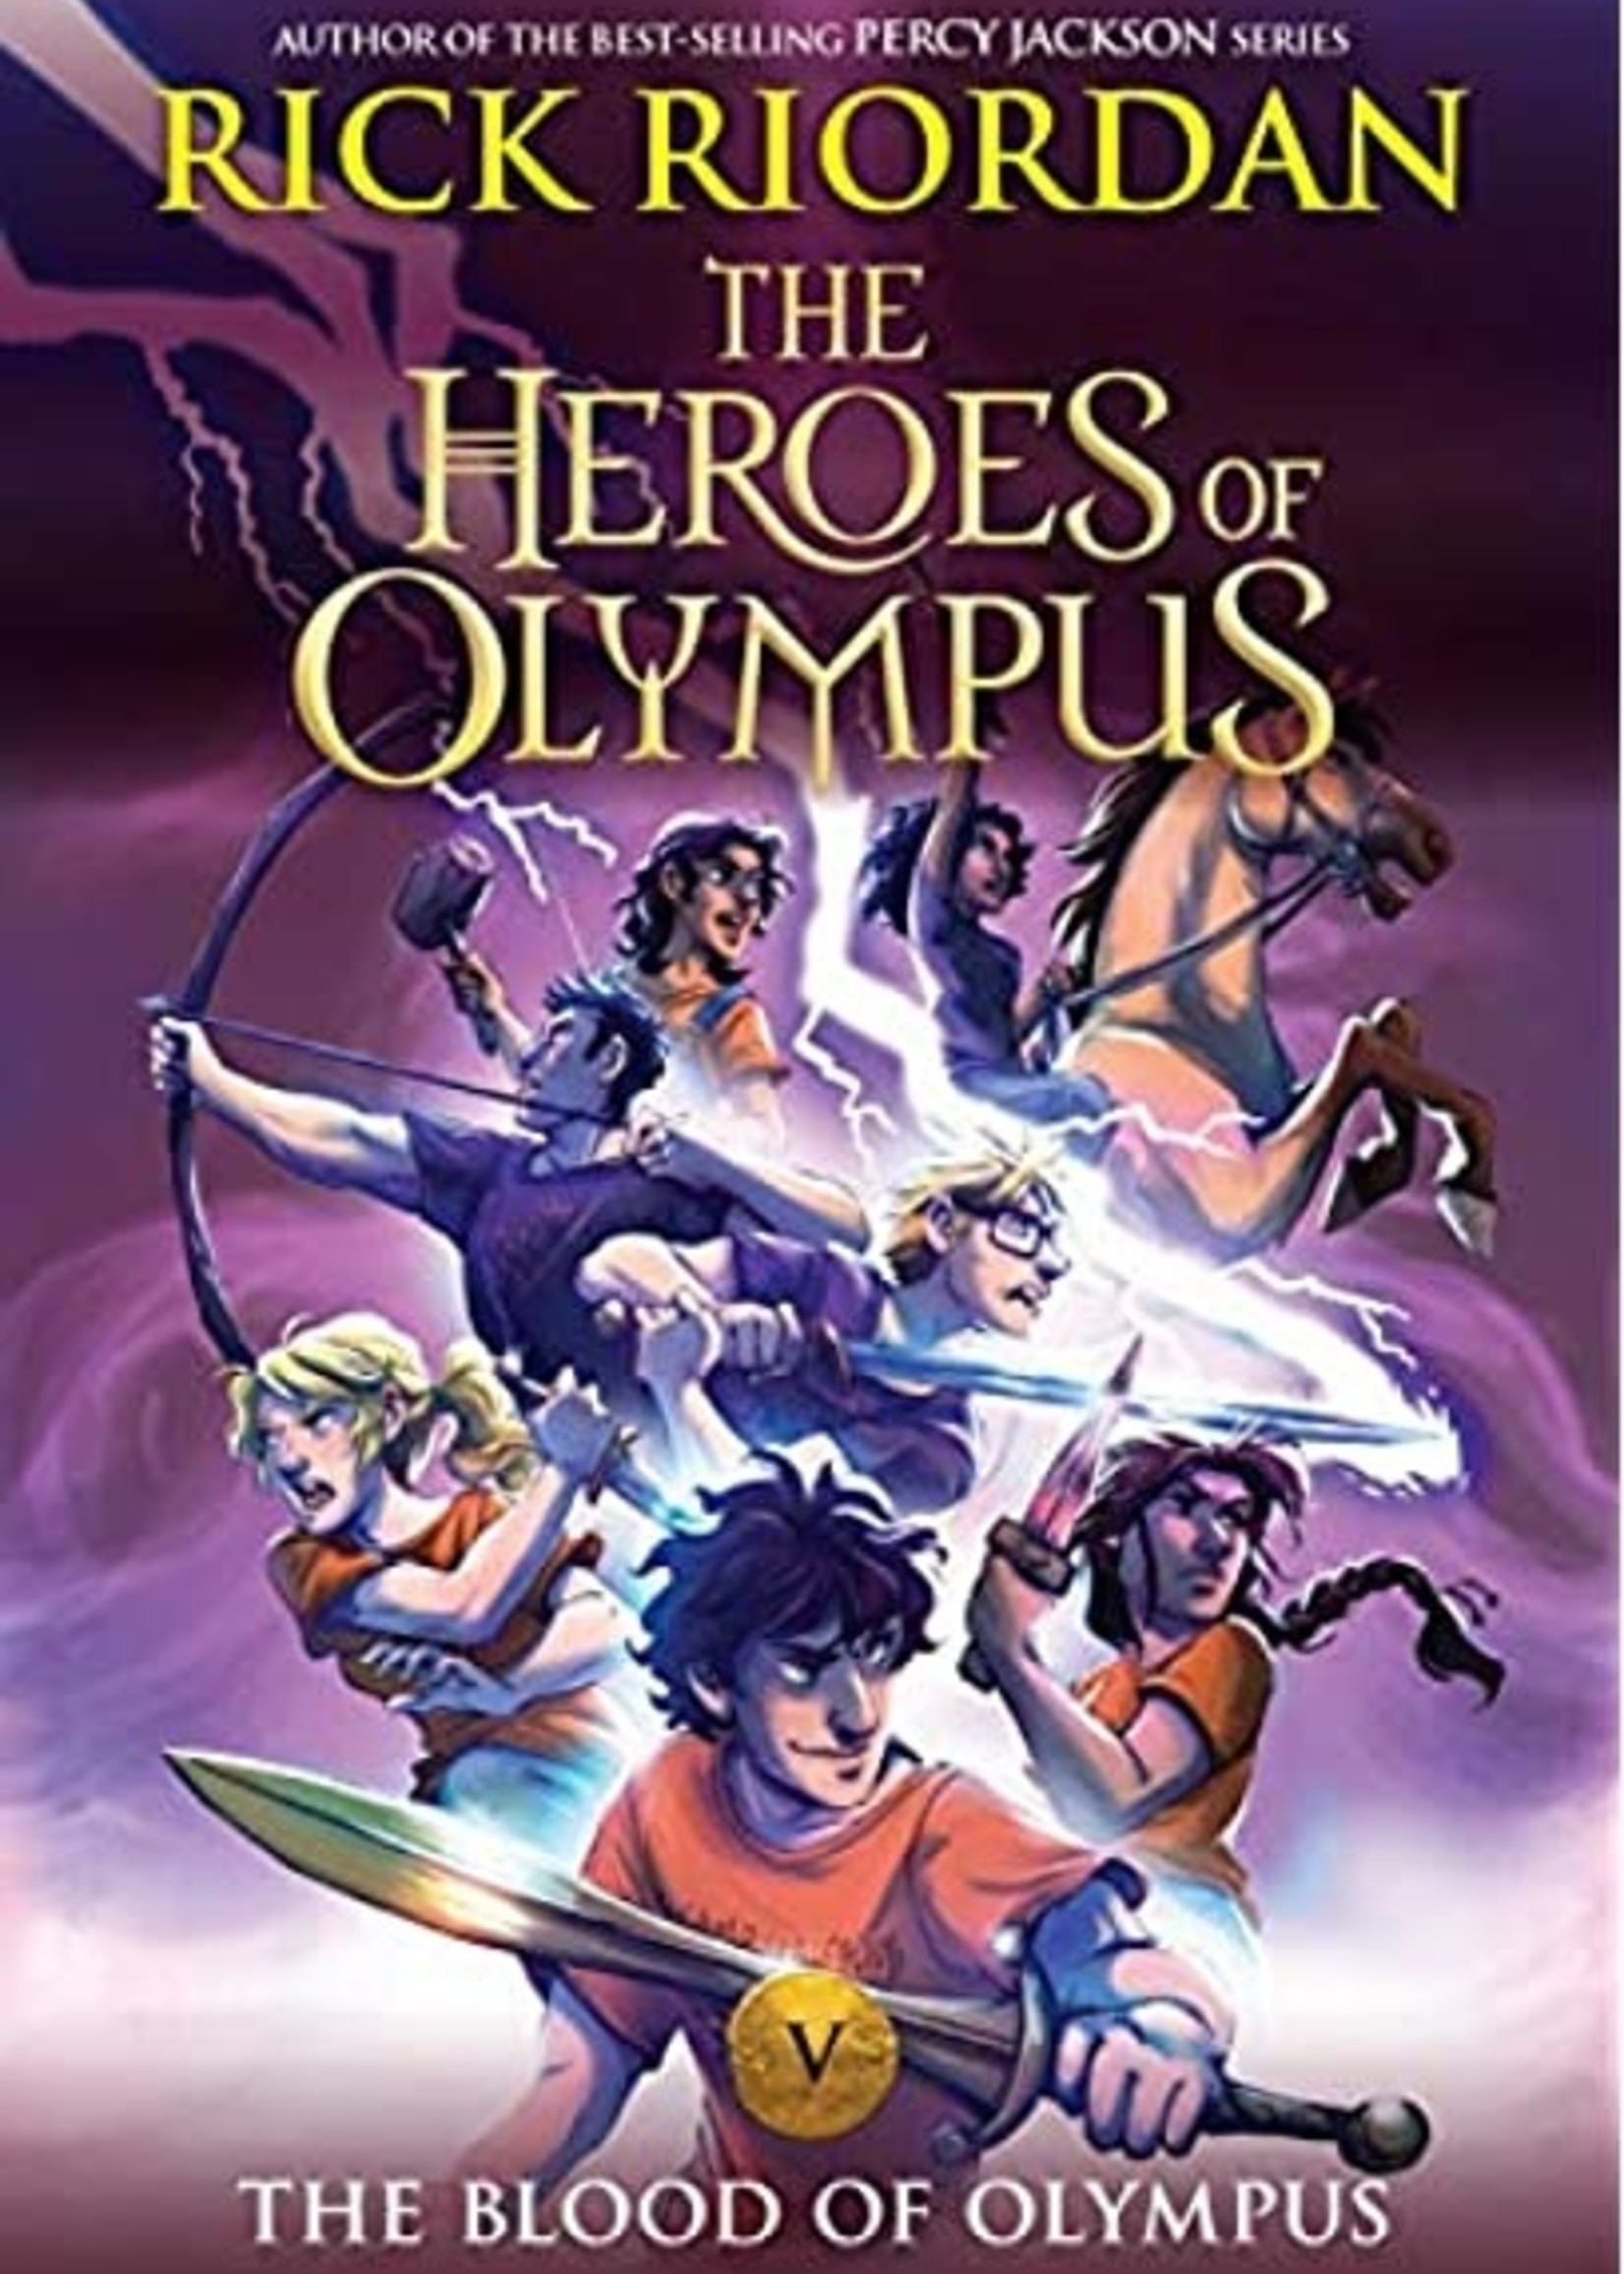 The Heroes of Olympus #05, The Blood of Olympus - Paperback